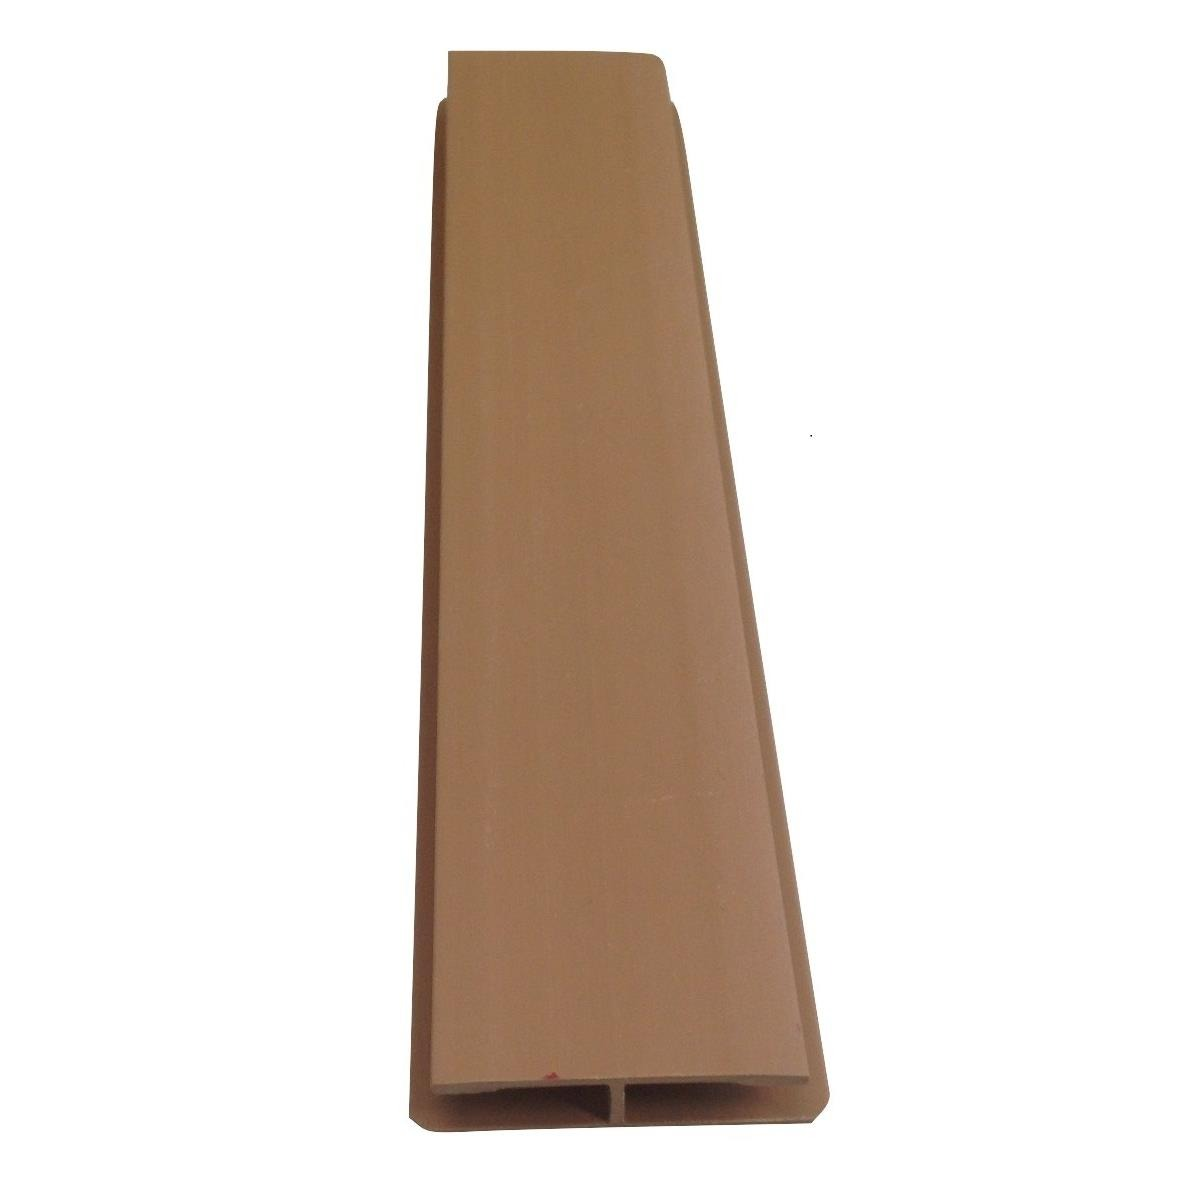 Perfil para PVC Emenda 6 m Marrom escuro - Perfilplast